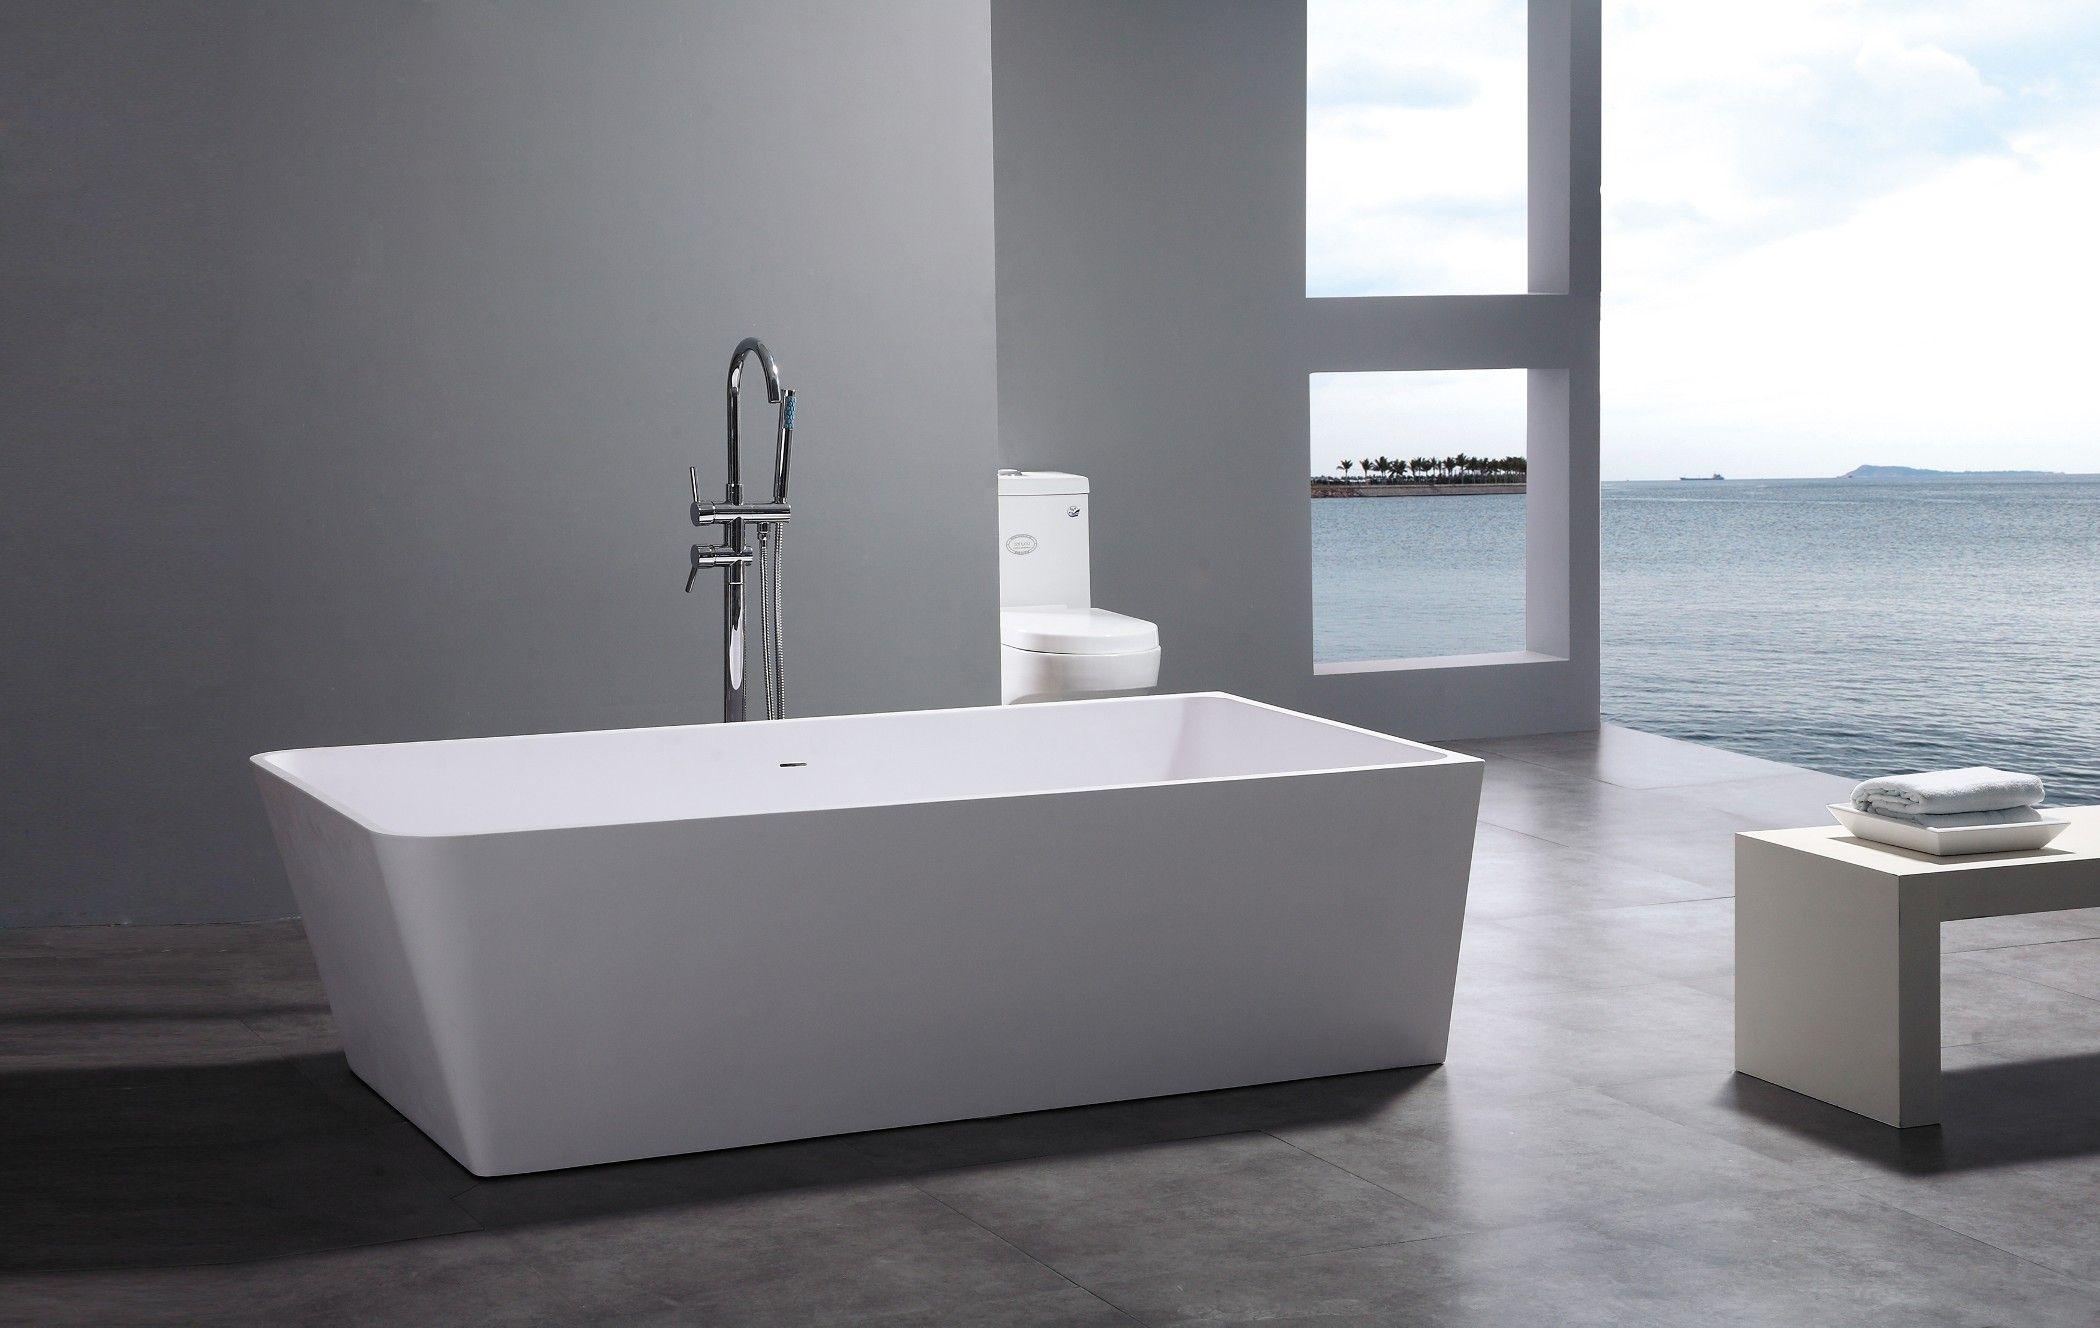 Leona Freestanding Soaking Tub 71   Imperial tile, Modern bathtub ...